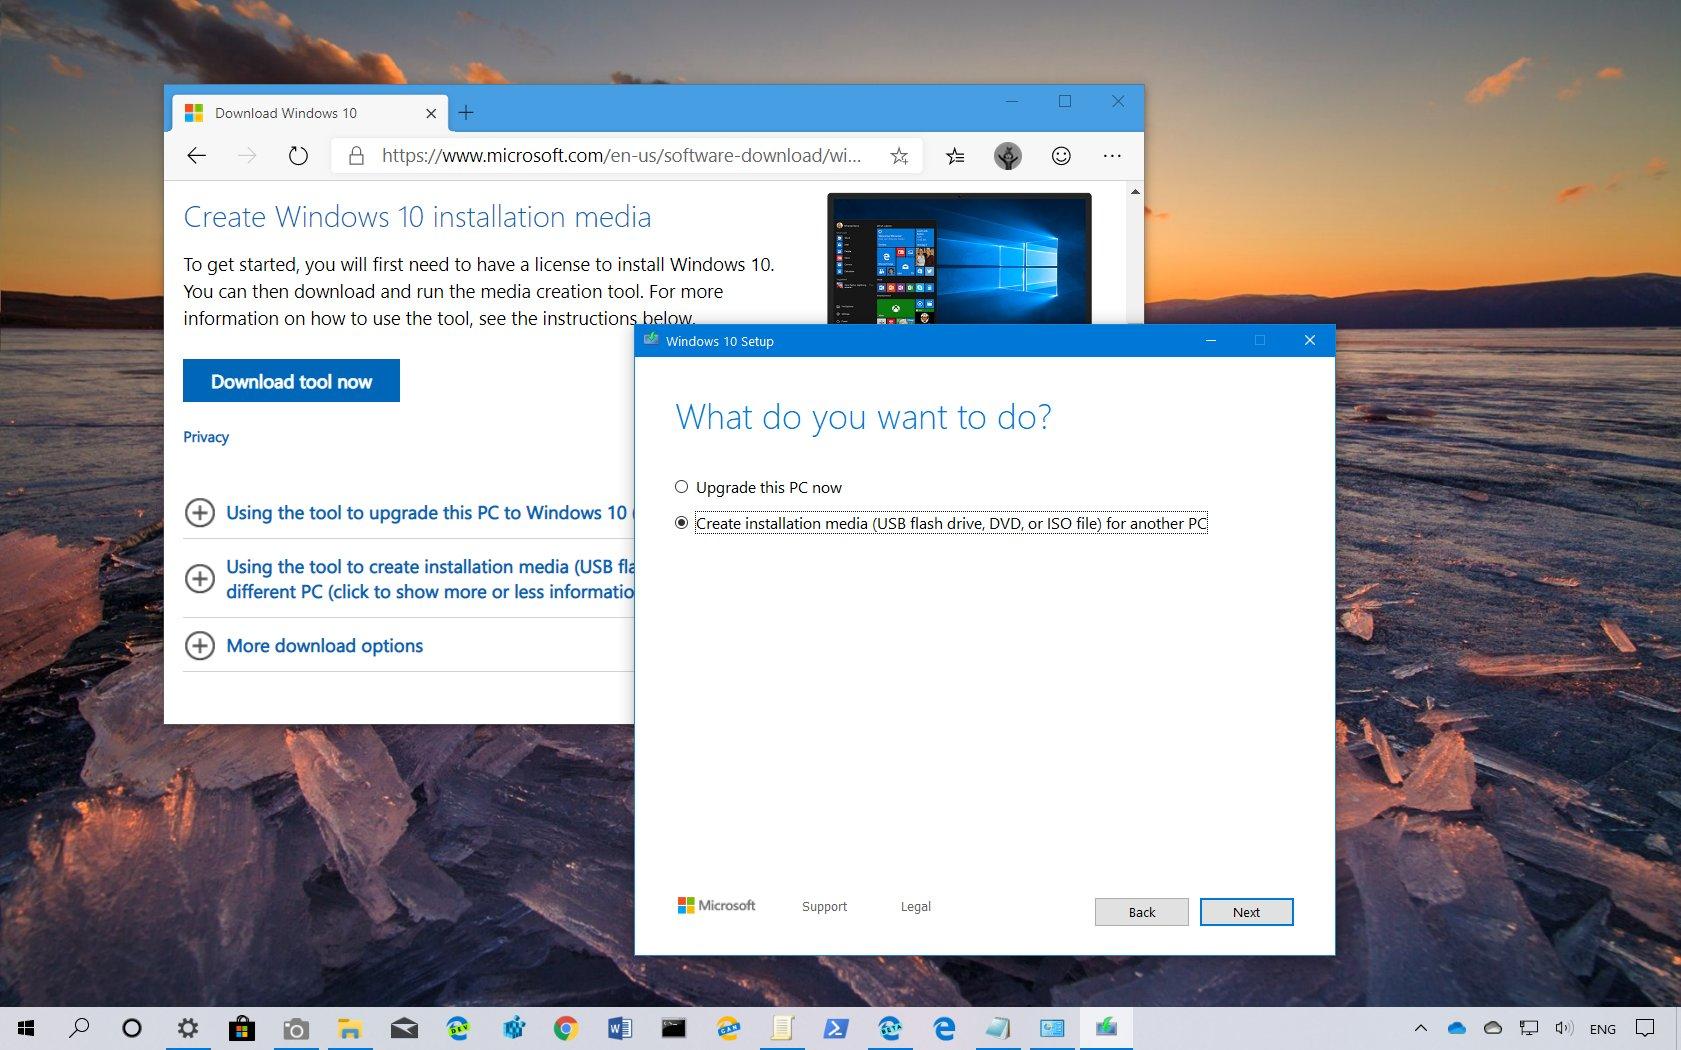 Windows 10 version 1909, May 2019 Update, Media Creation Tool download